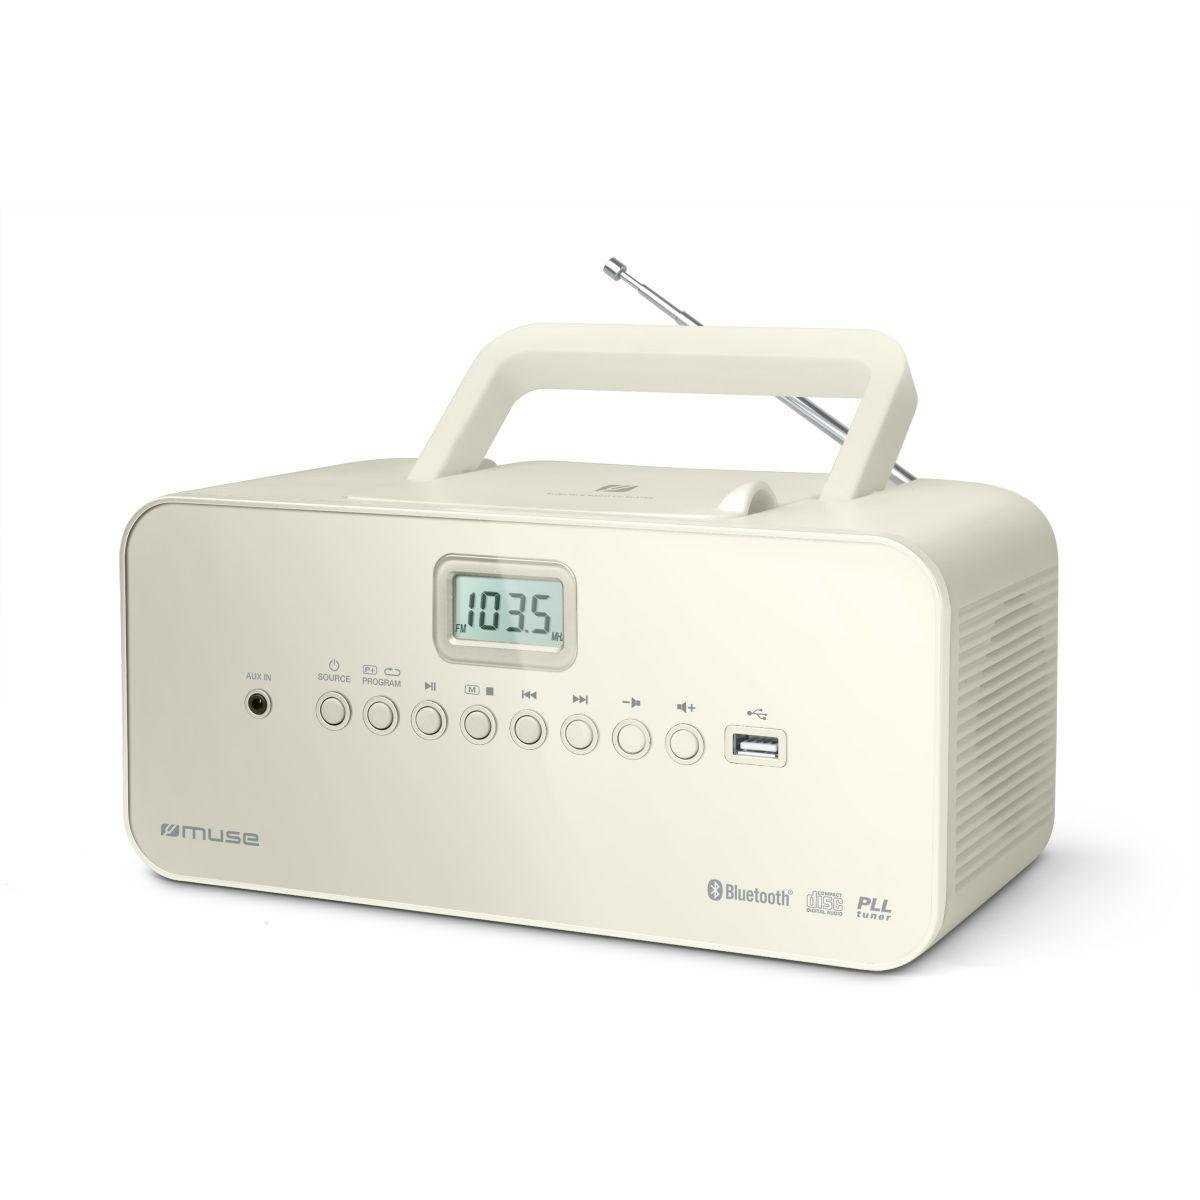 Radio cd muse m-30 bt blanc (photo)